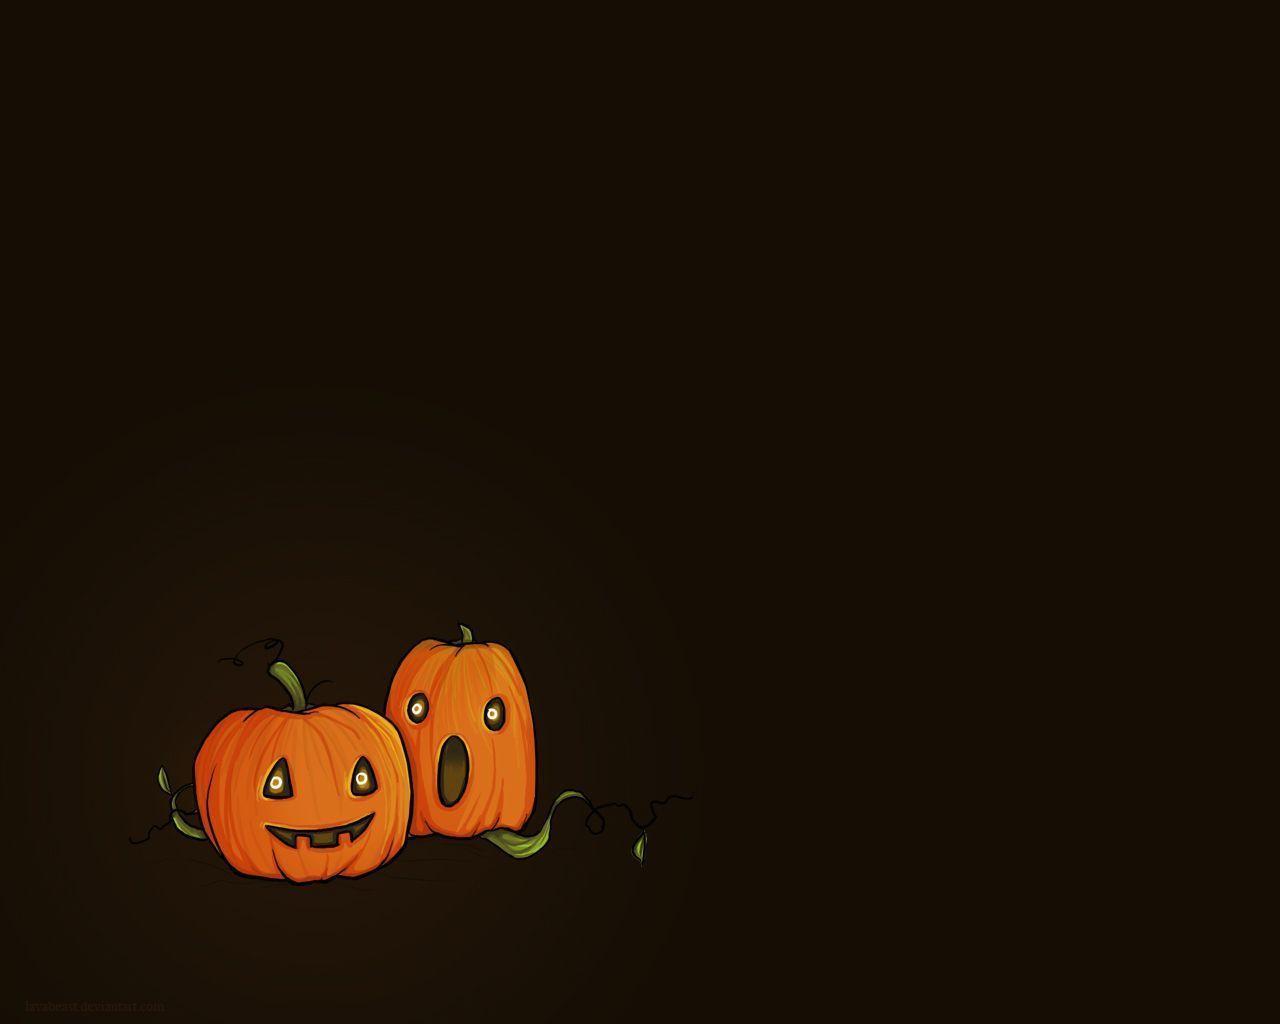 Cute Halloween Desktop Backgrounds 1280x1024